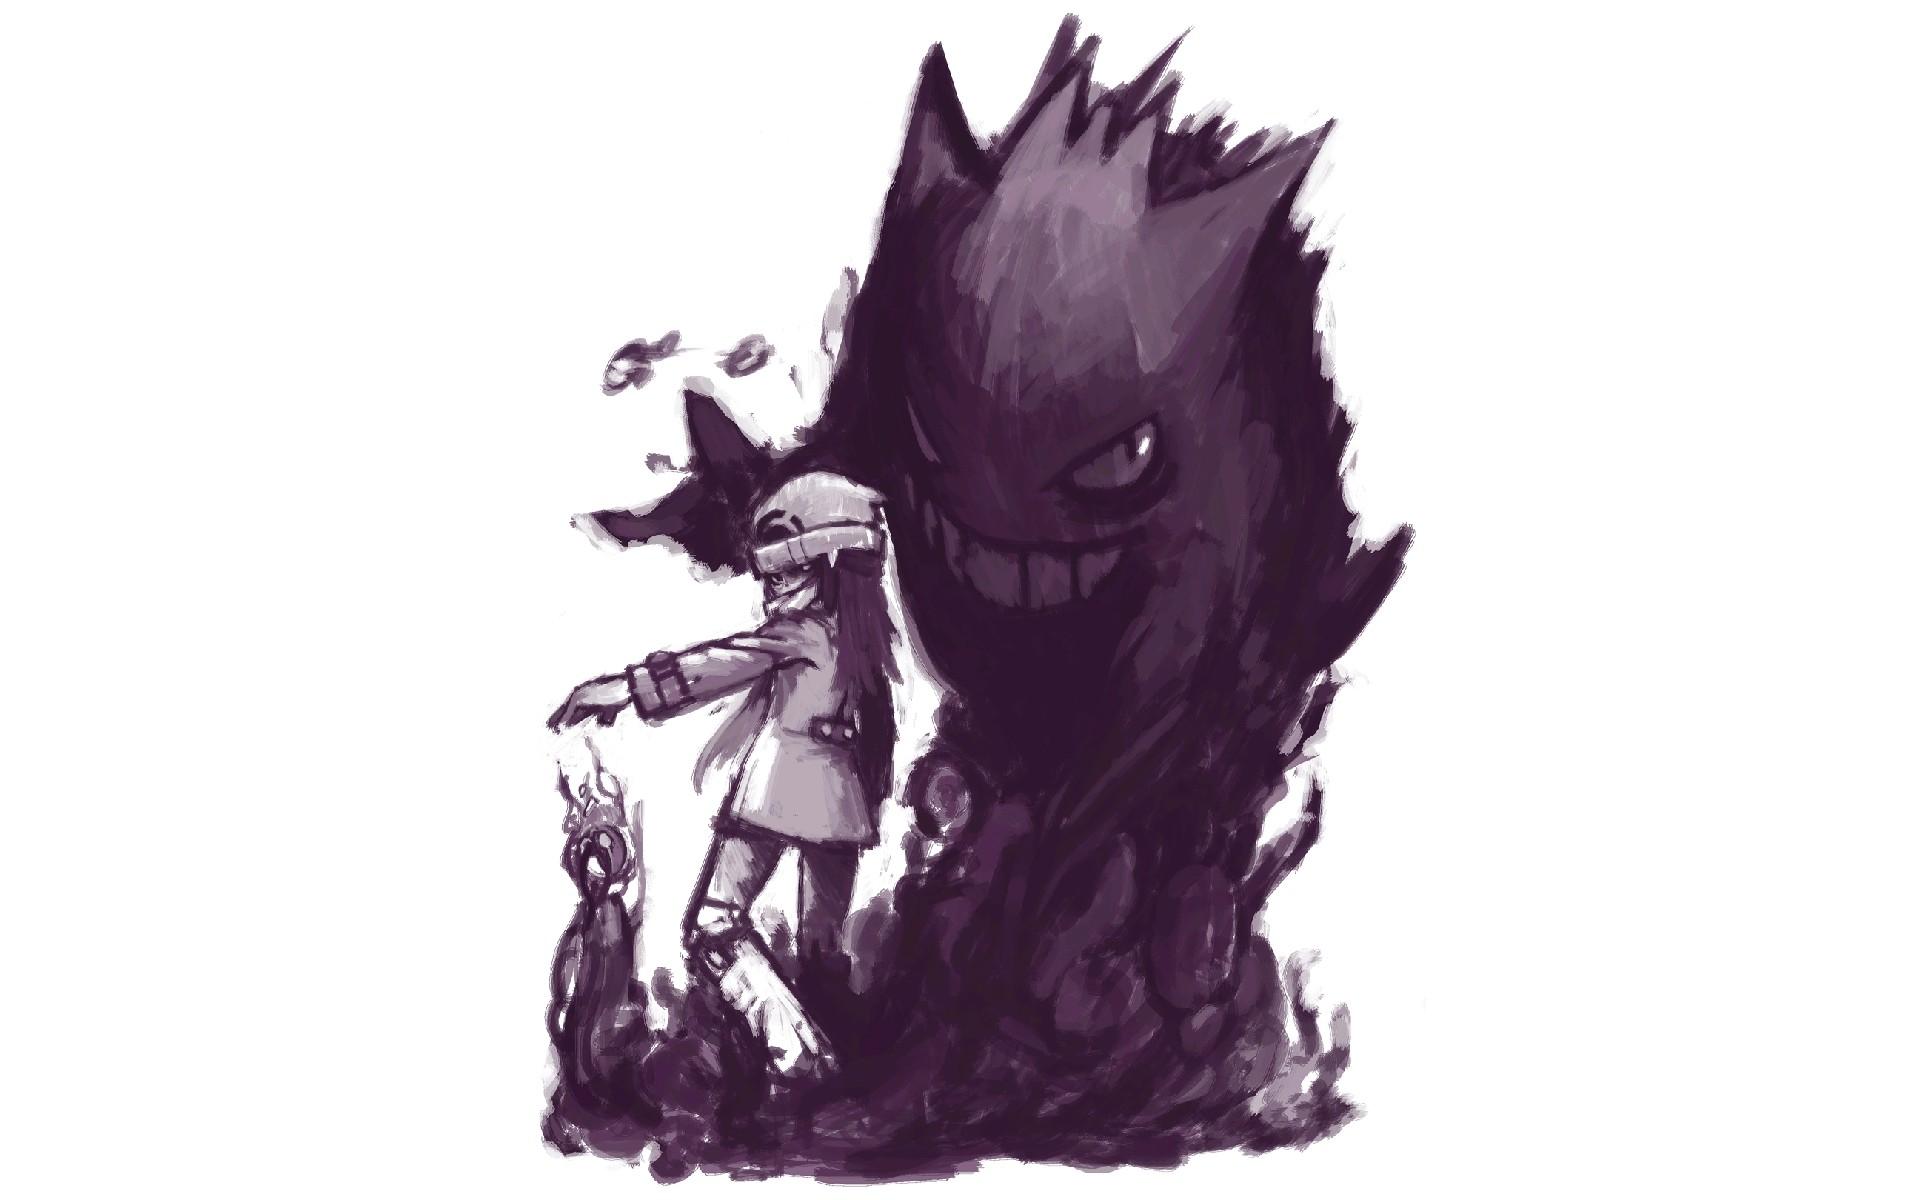 Pokemon Art: Gengar HD Wallpaper